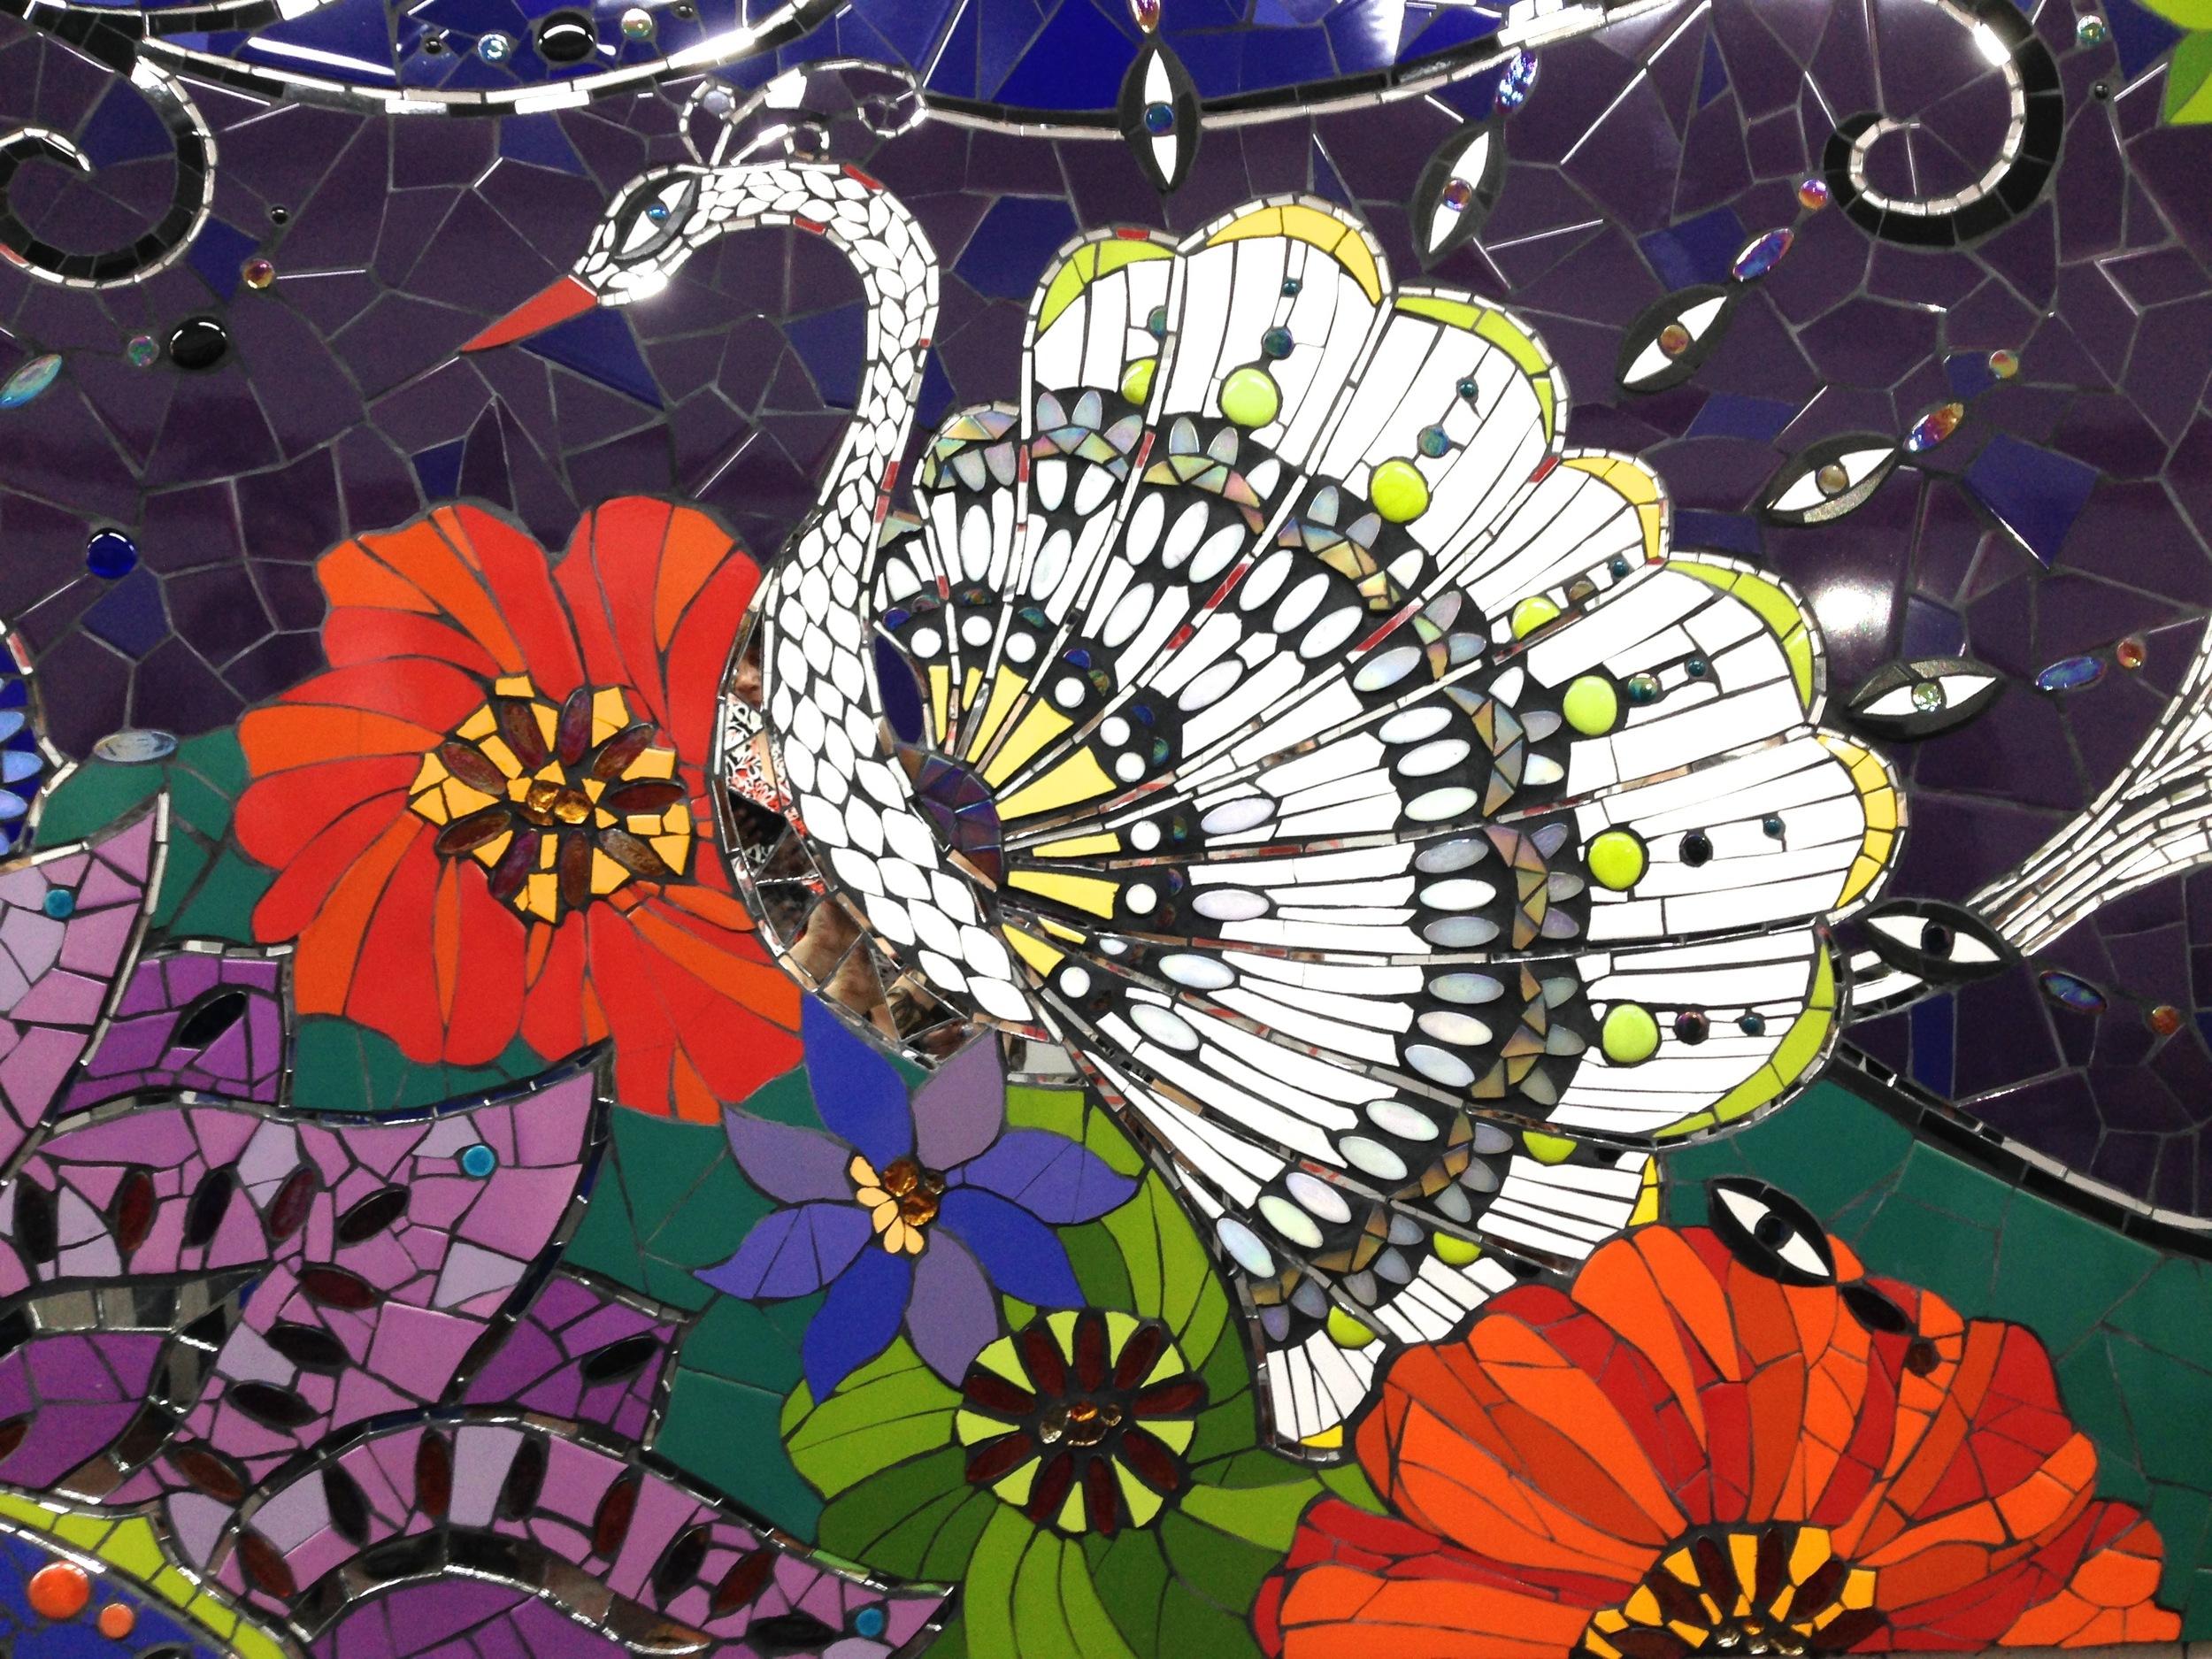 Detail, Mosaic Mural Created during Laurel True's Mural Making Workshop at FJ Mosaic Art in Buenos Aires 2014